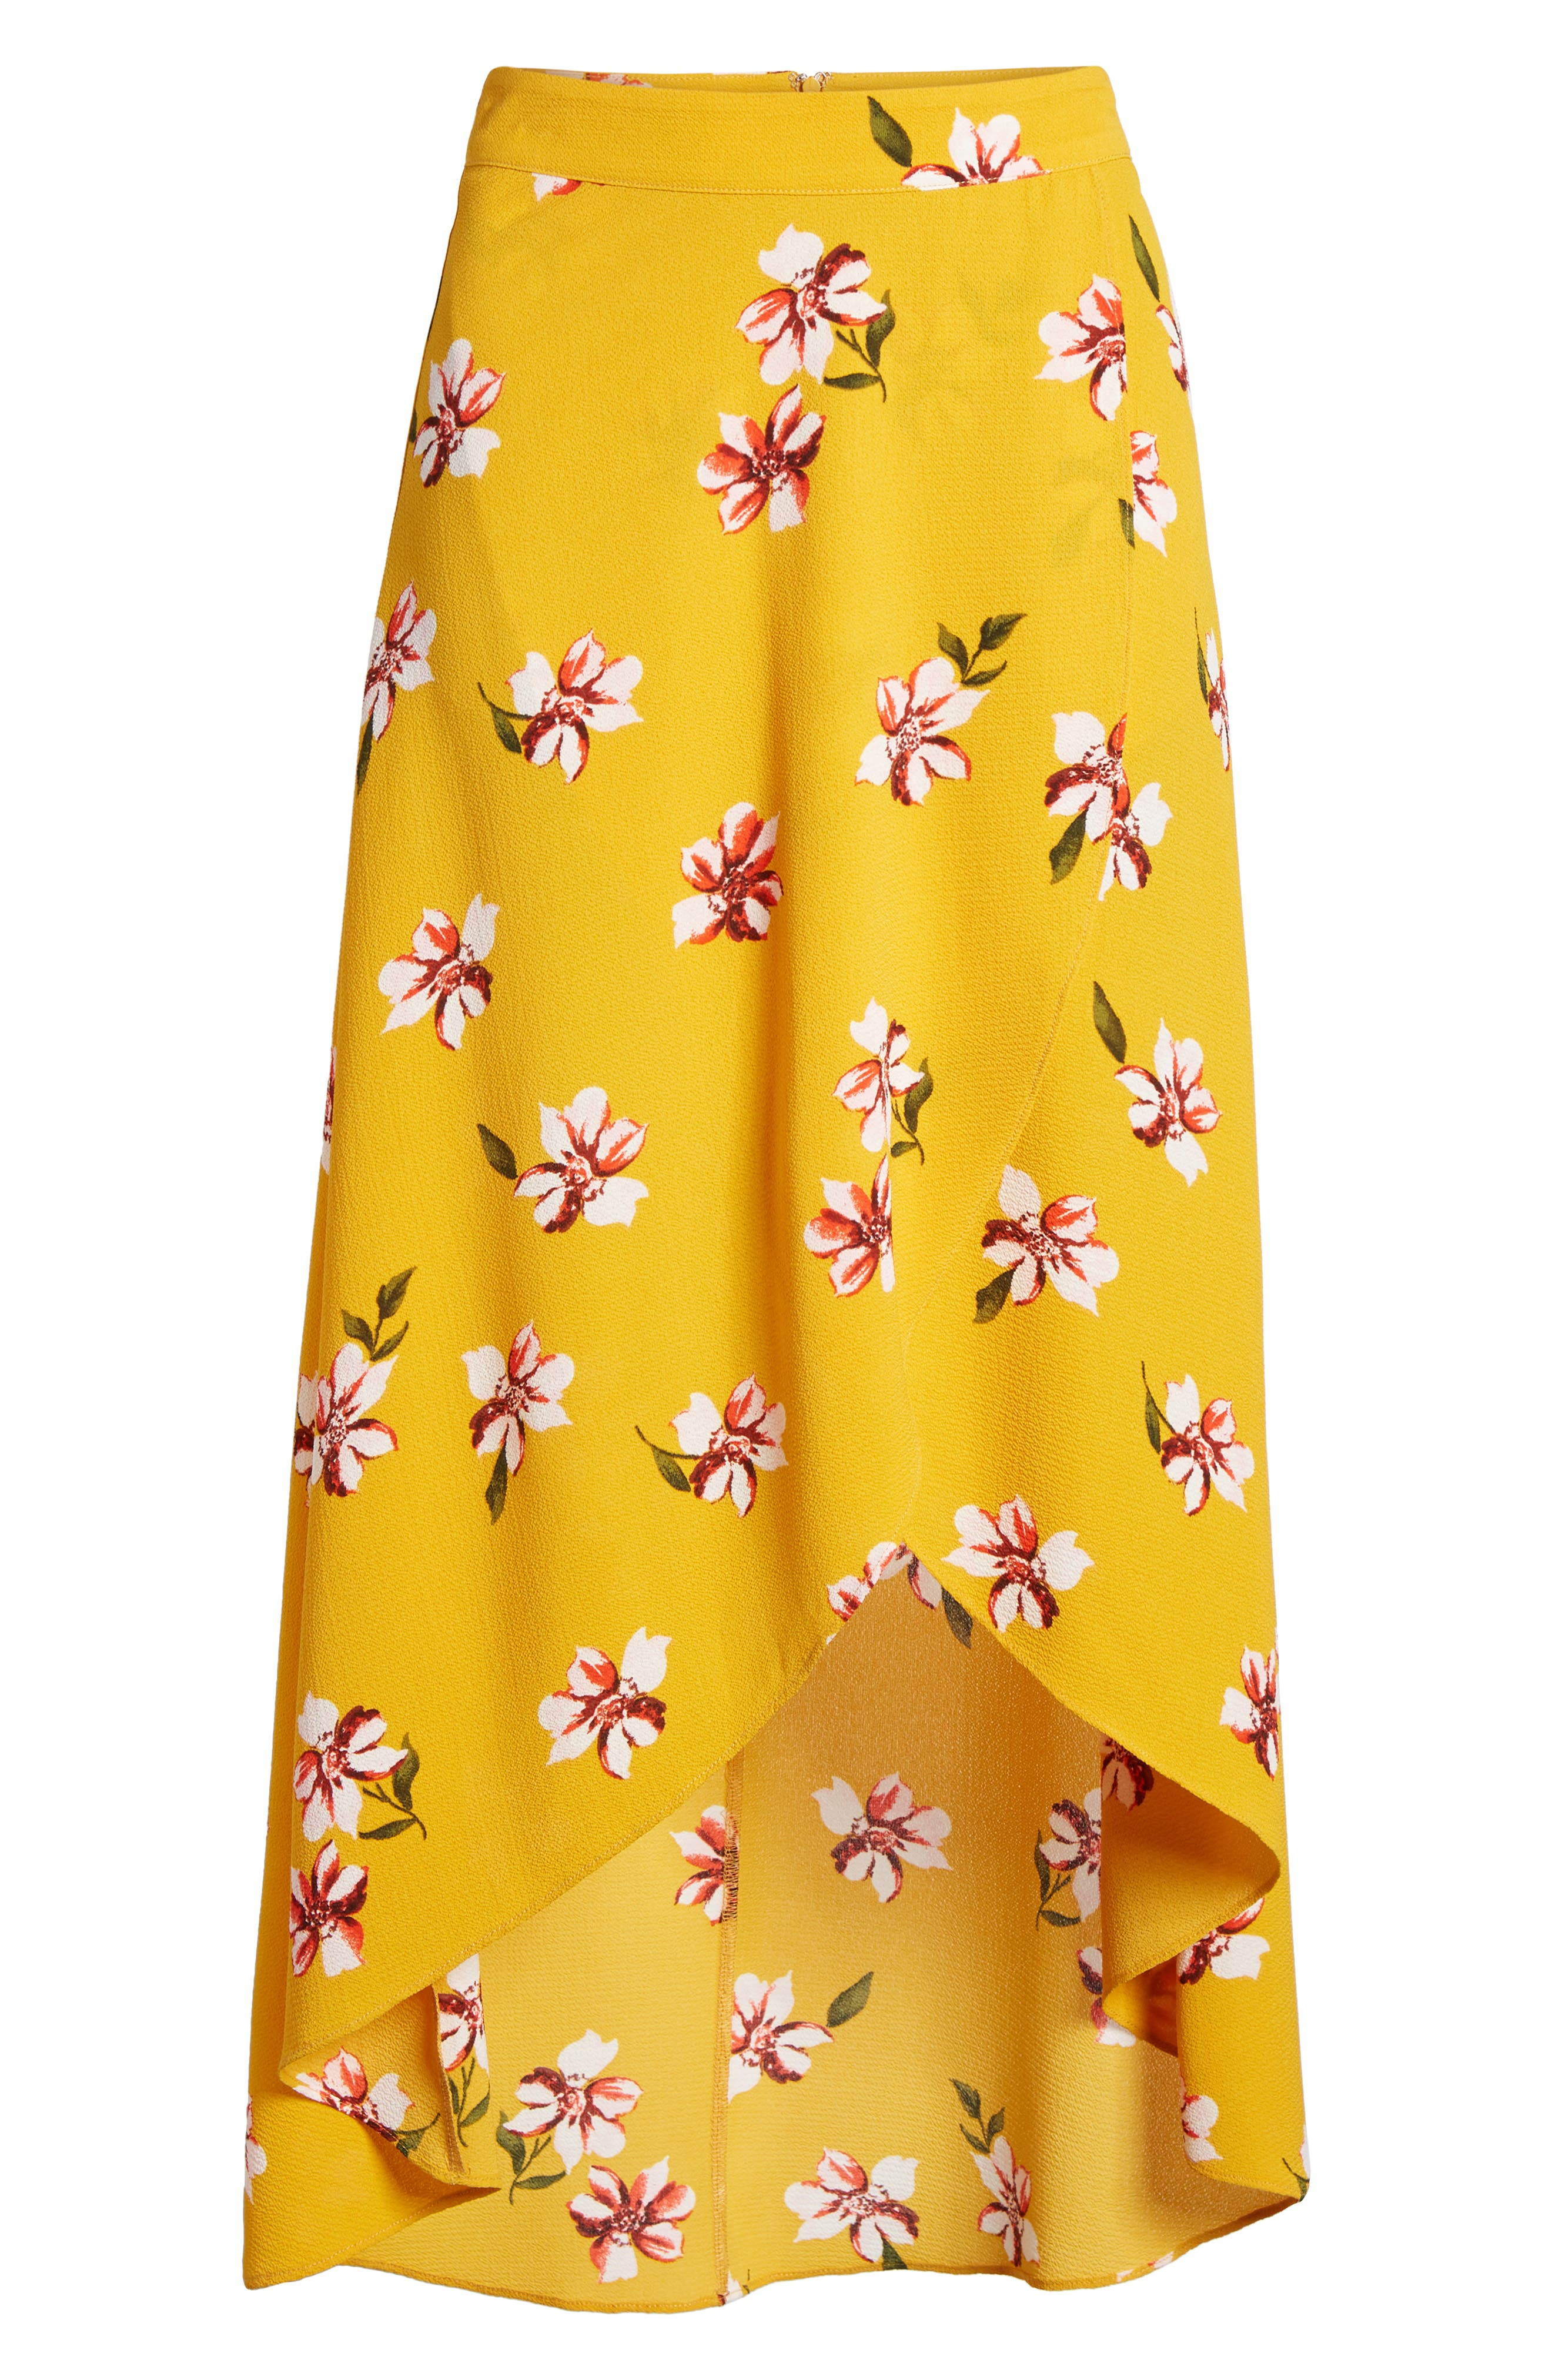 Floral Surplice Skirt,                             Alternate thumbnail 7, color,                             Mustard Floral